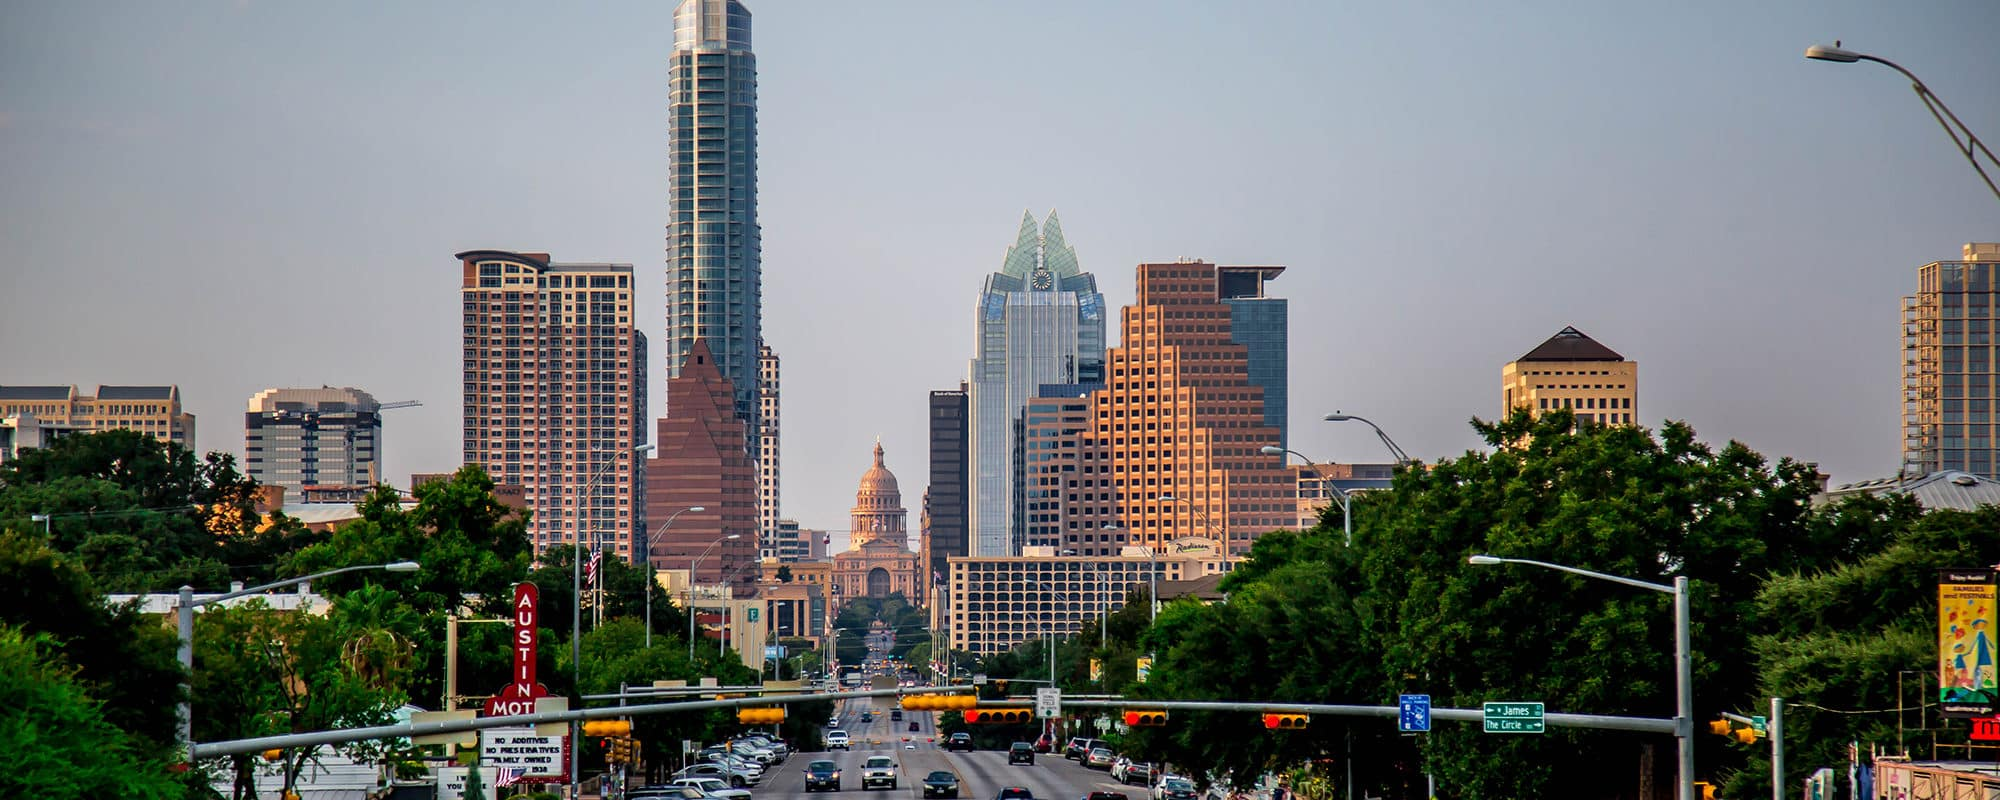 South Congress Avenue - Austin, TX